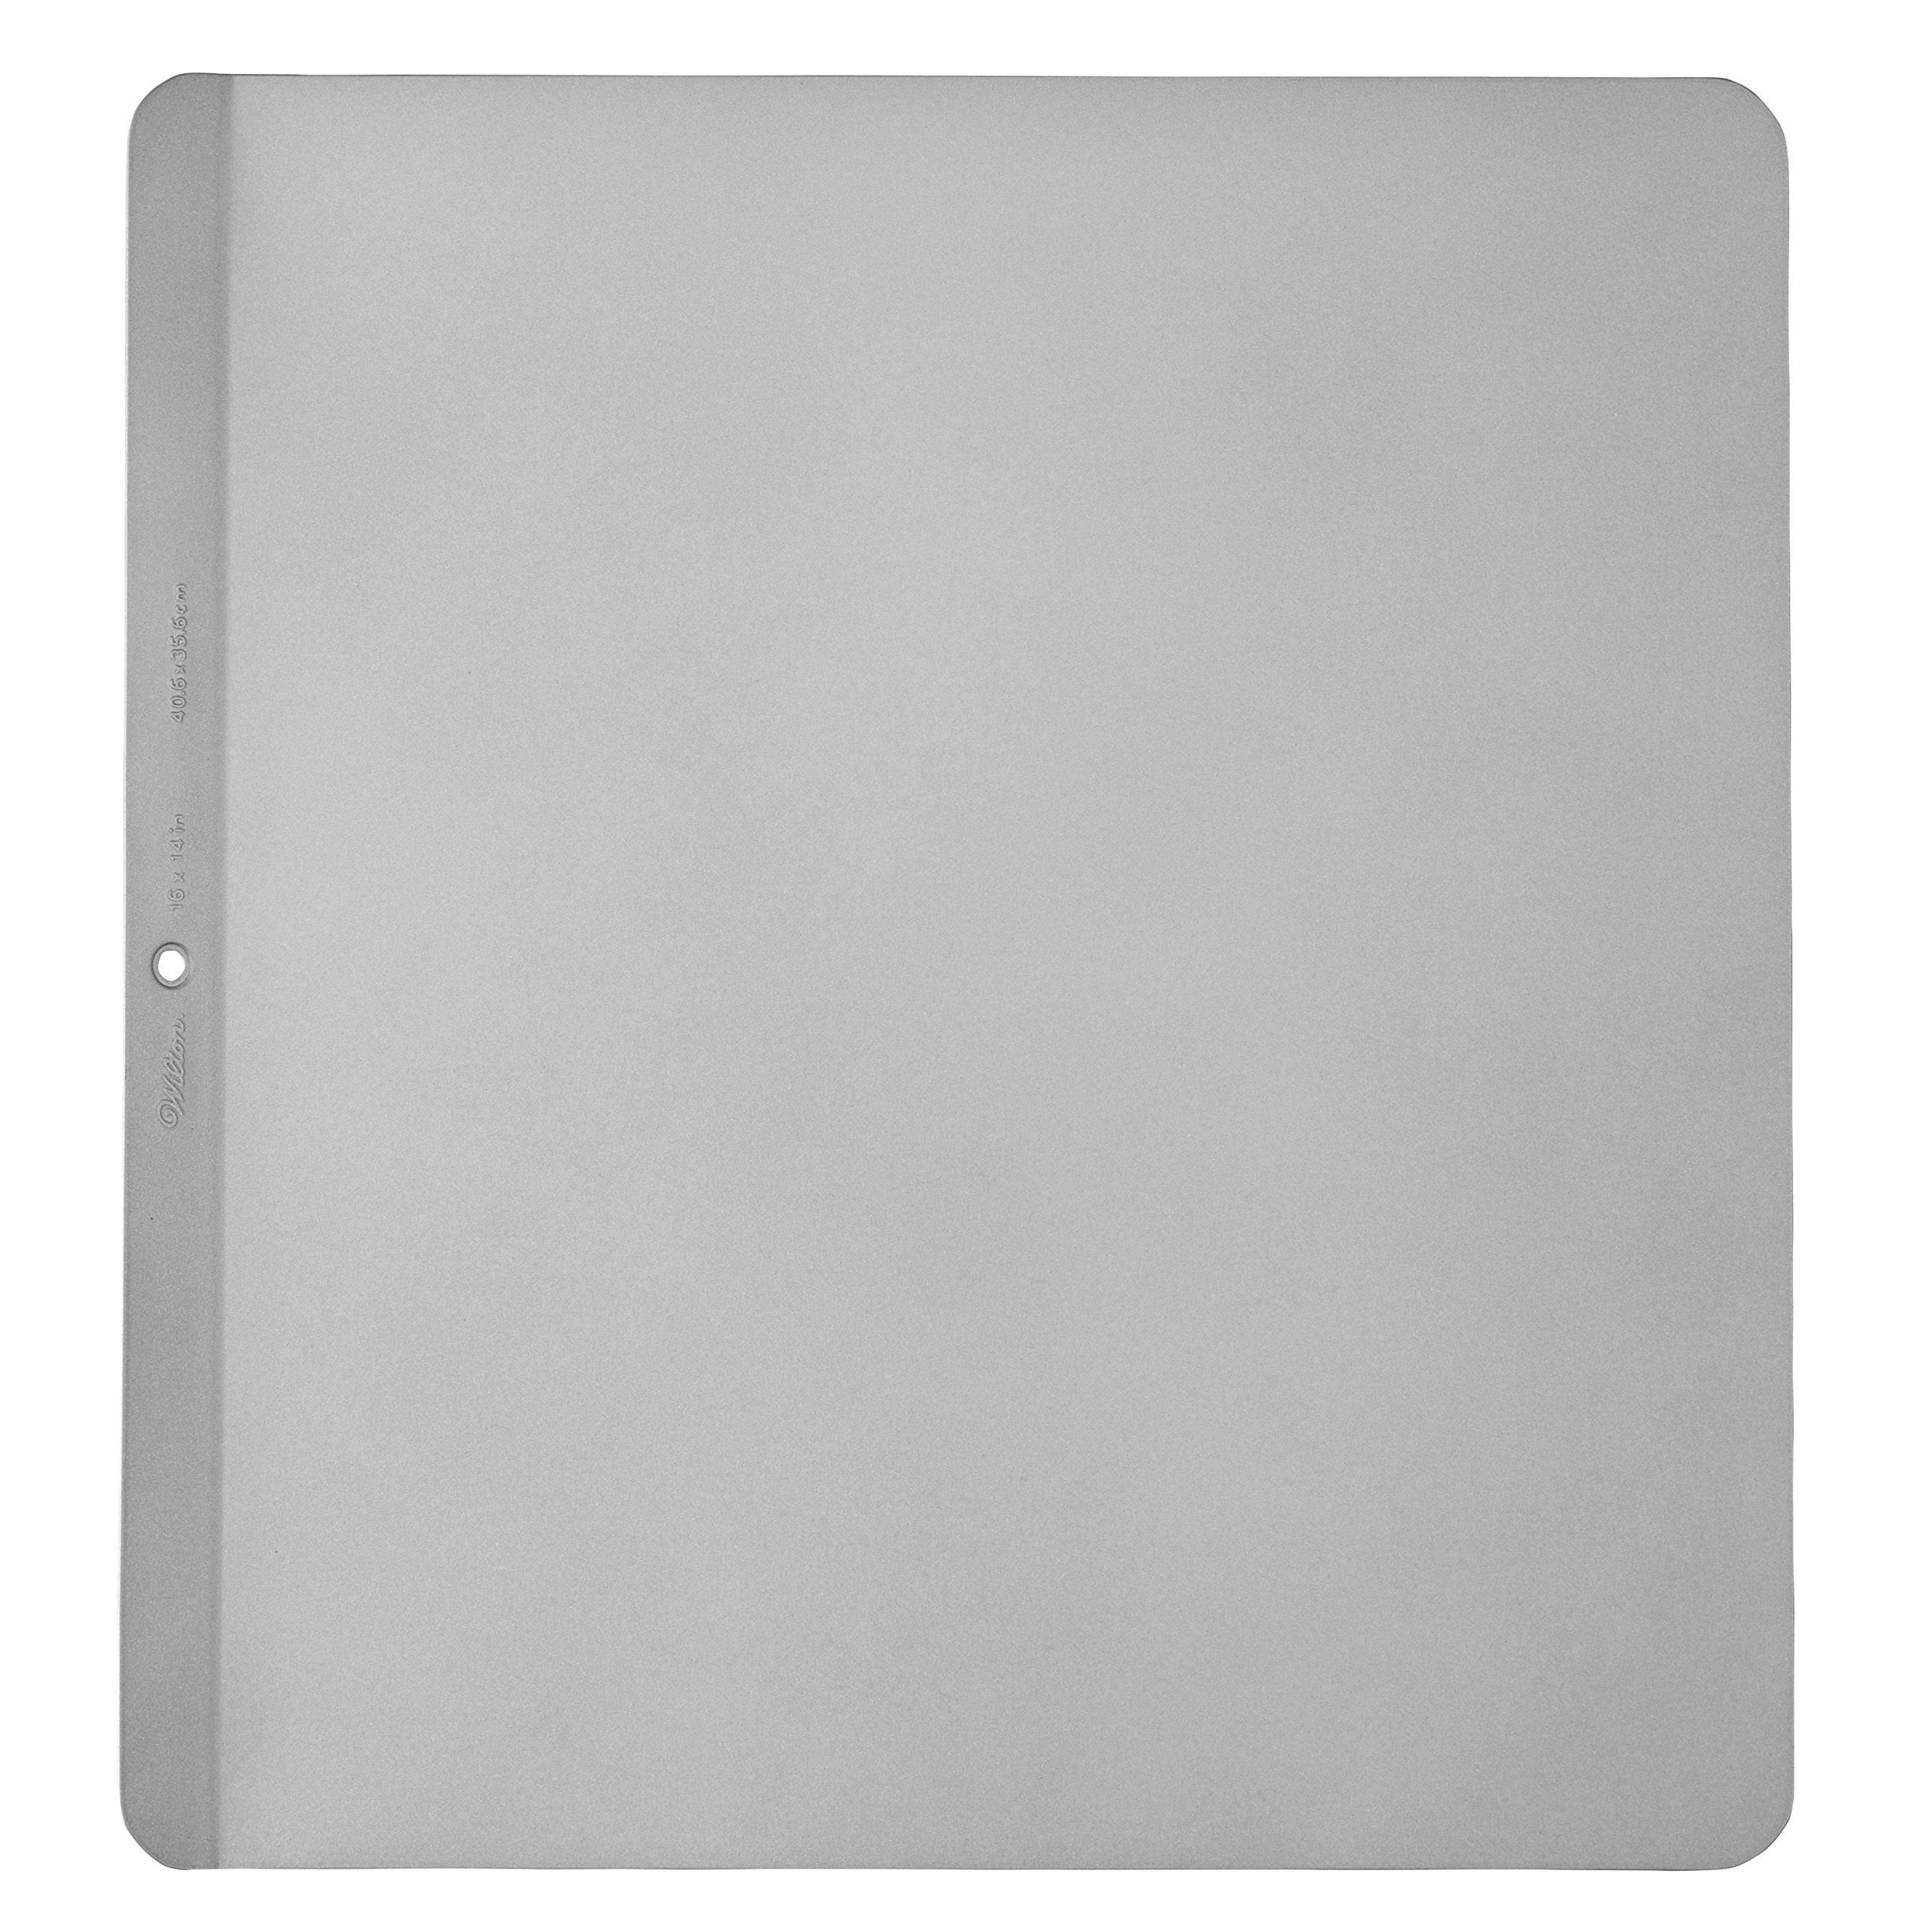 Wilton Recipe Right Air Cookie Sheet, 16 x 14 Inch